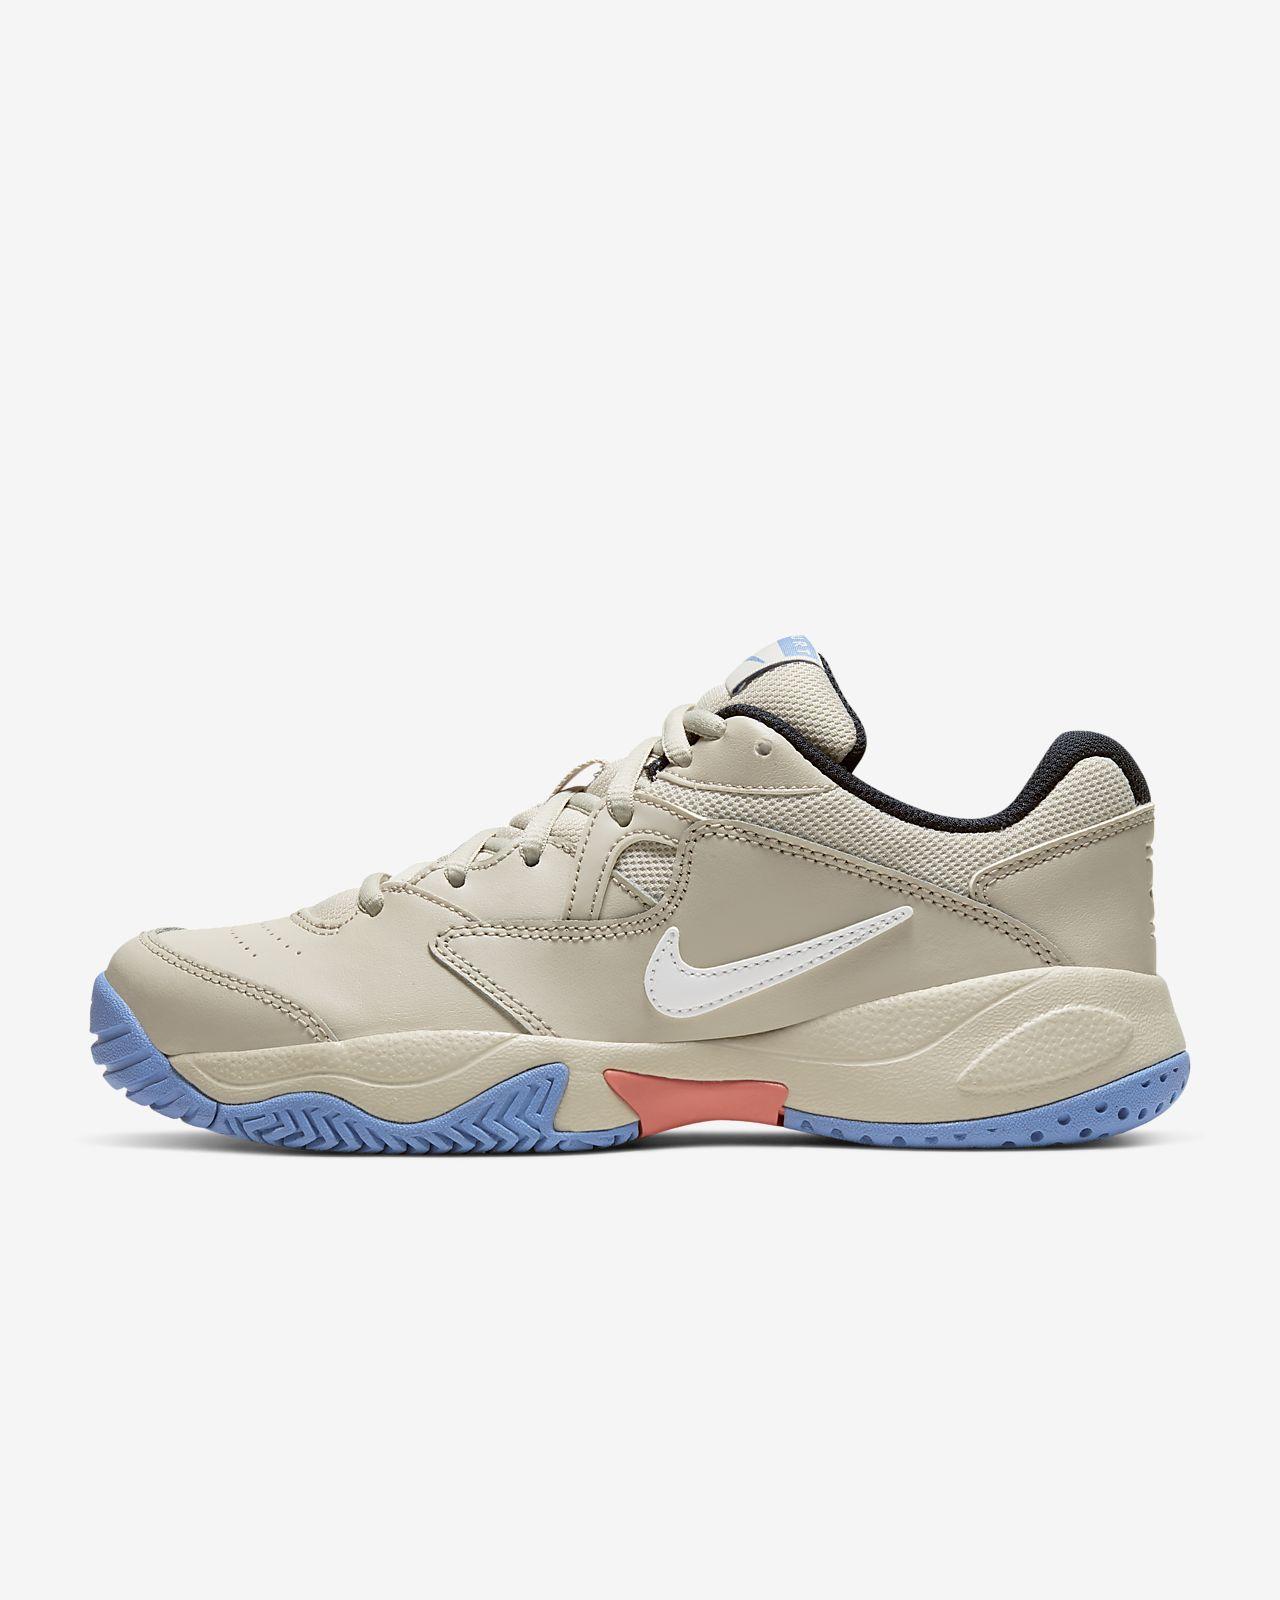 Hard Court Tennis Shoe. Nike HR